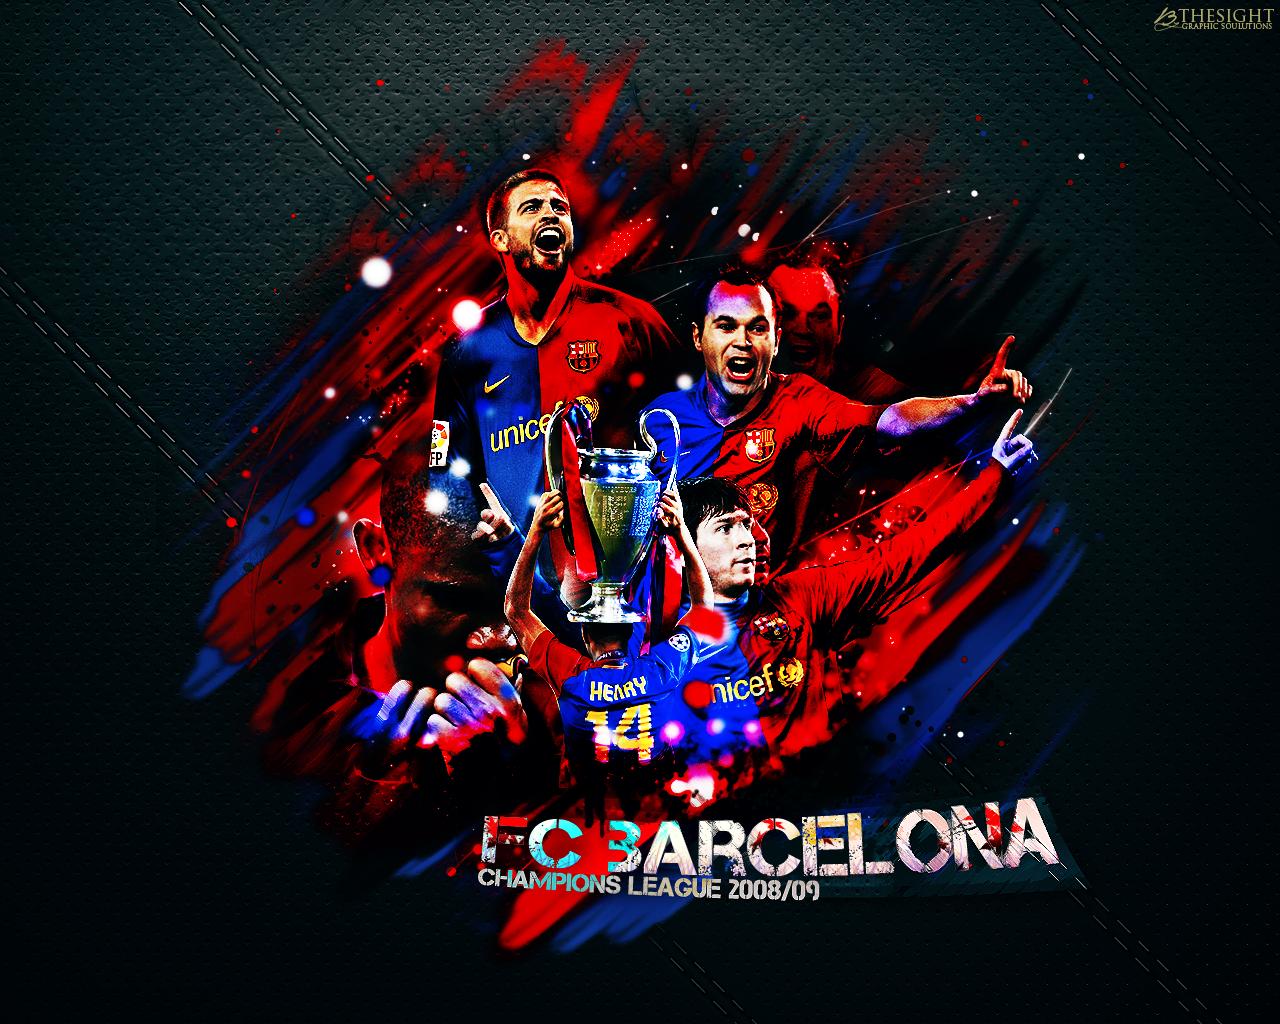 World Sports fc barcelona wallpaper 2011 images 1280x1024